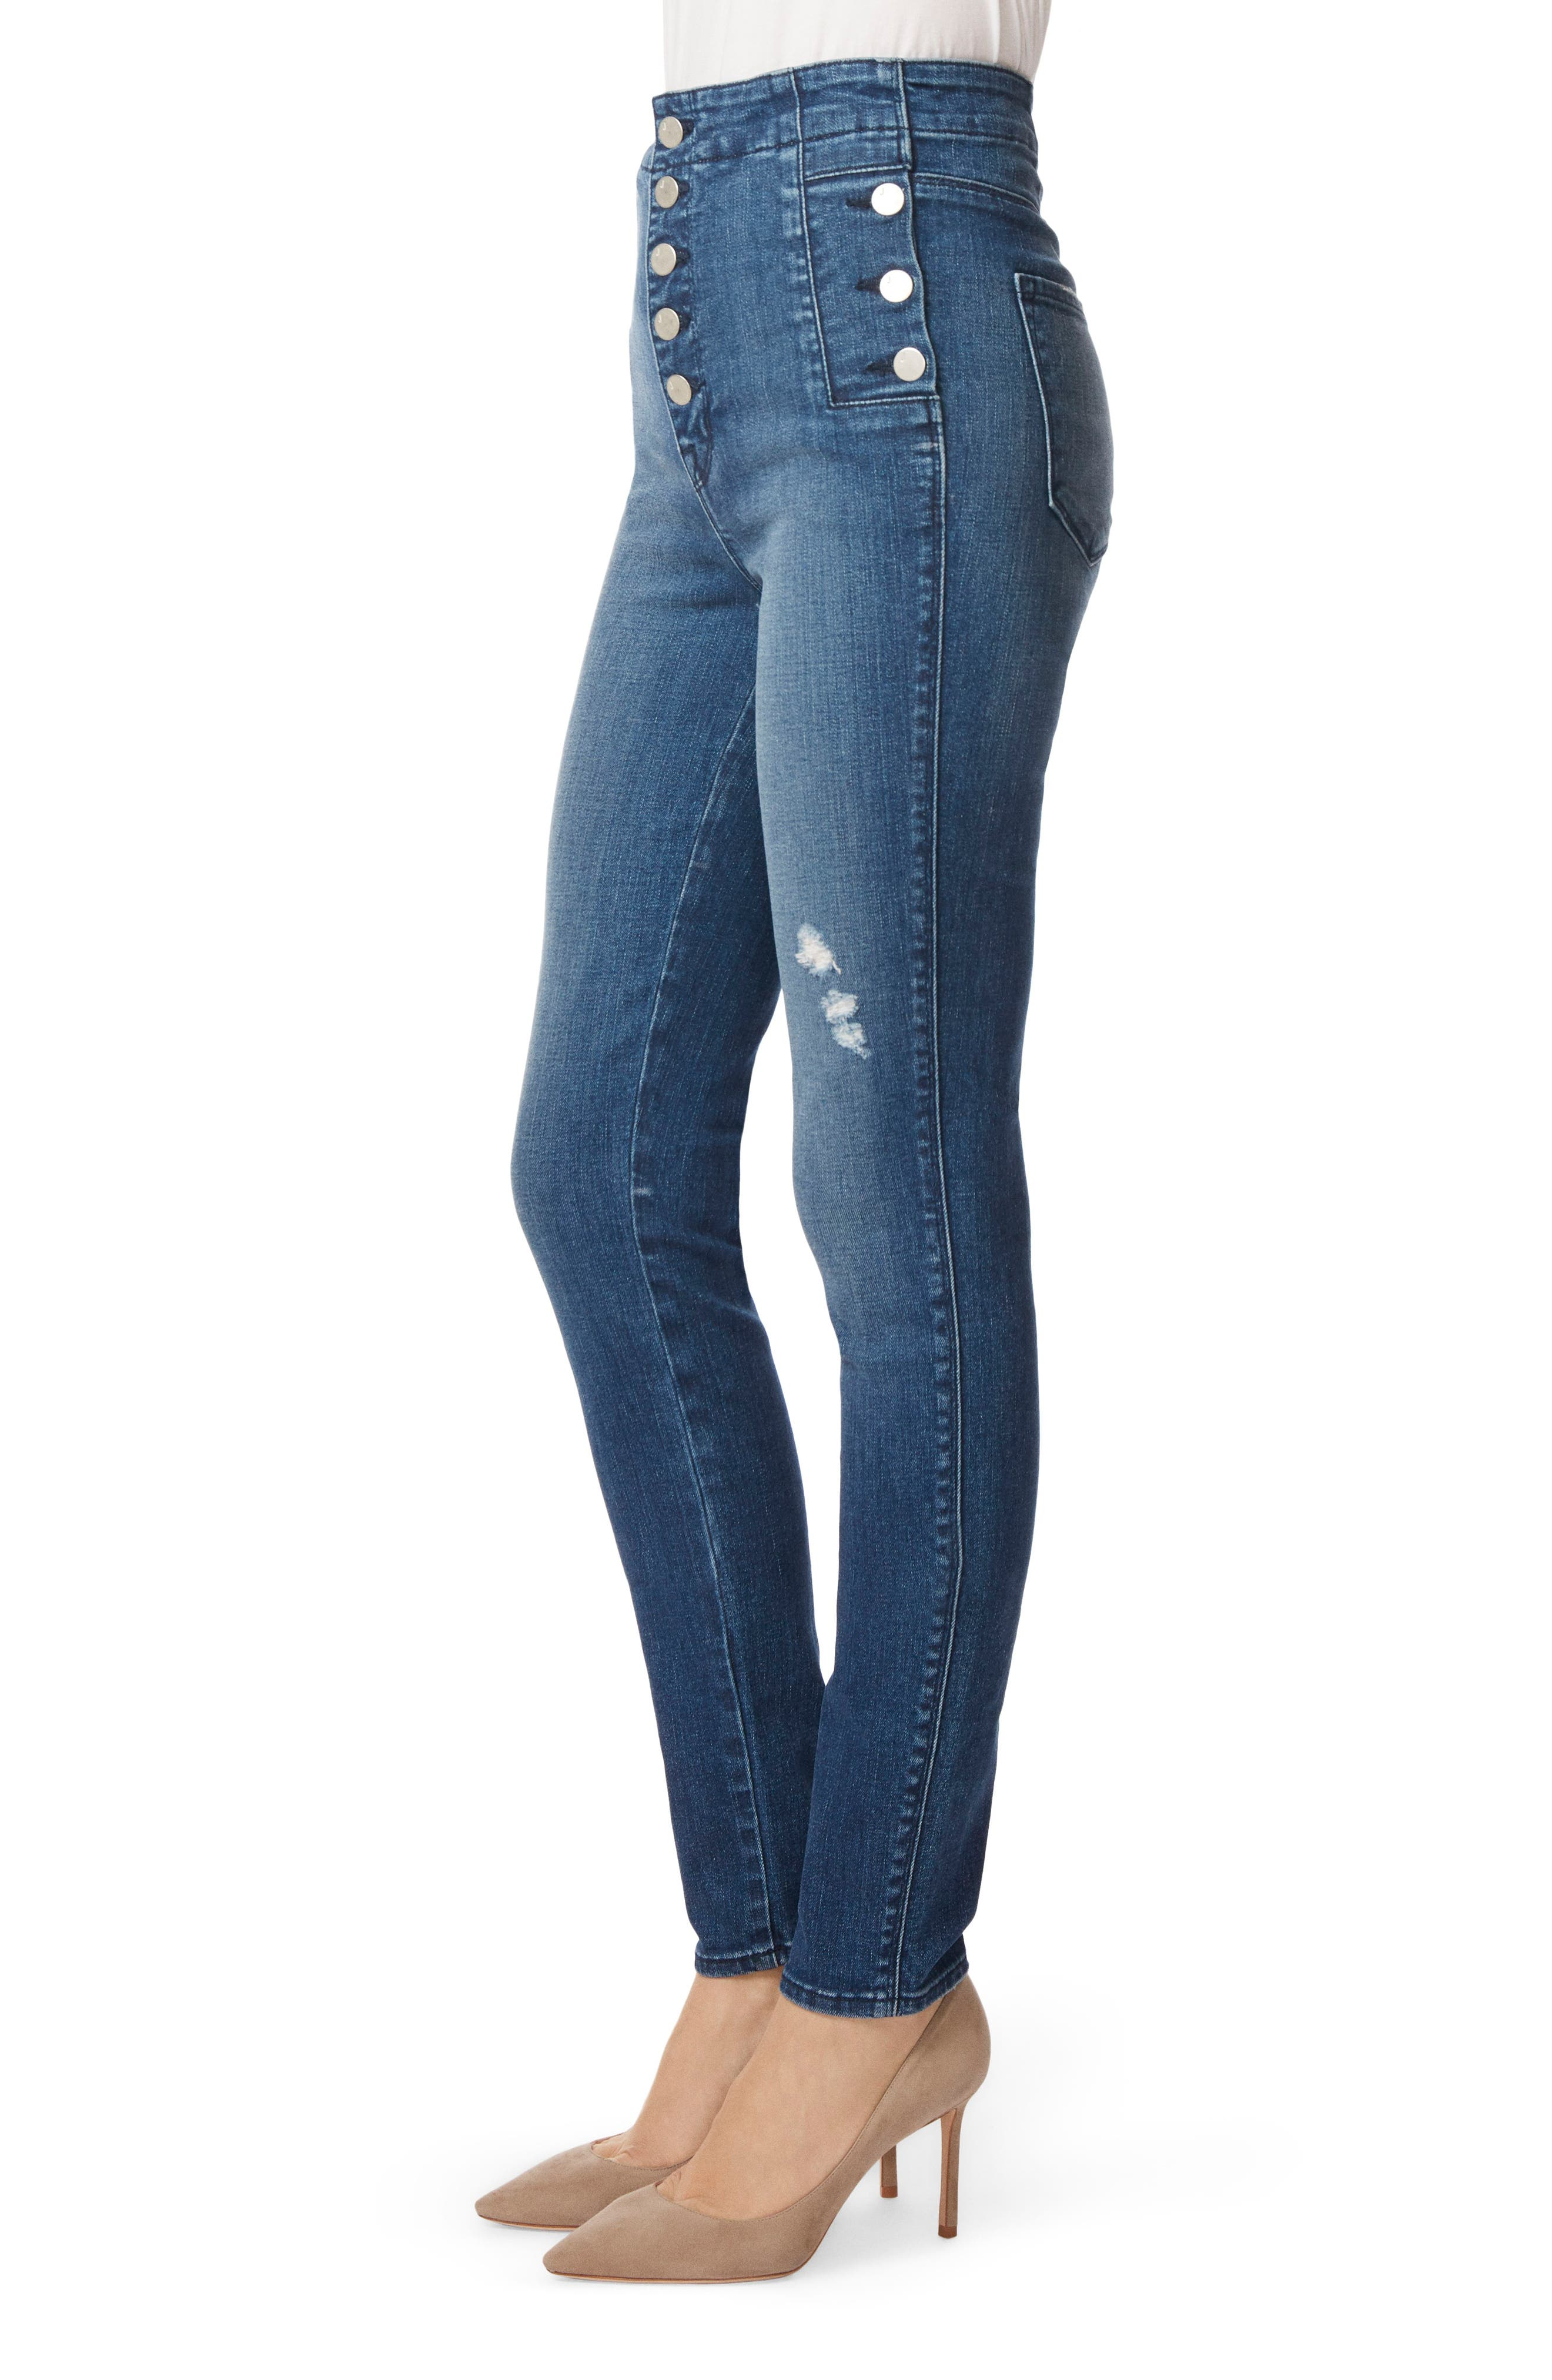 Natasha Sky High High Waist Skinny Jeans,                             Alternate thumbnail 3, color,                             234